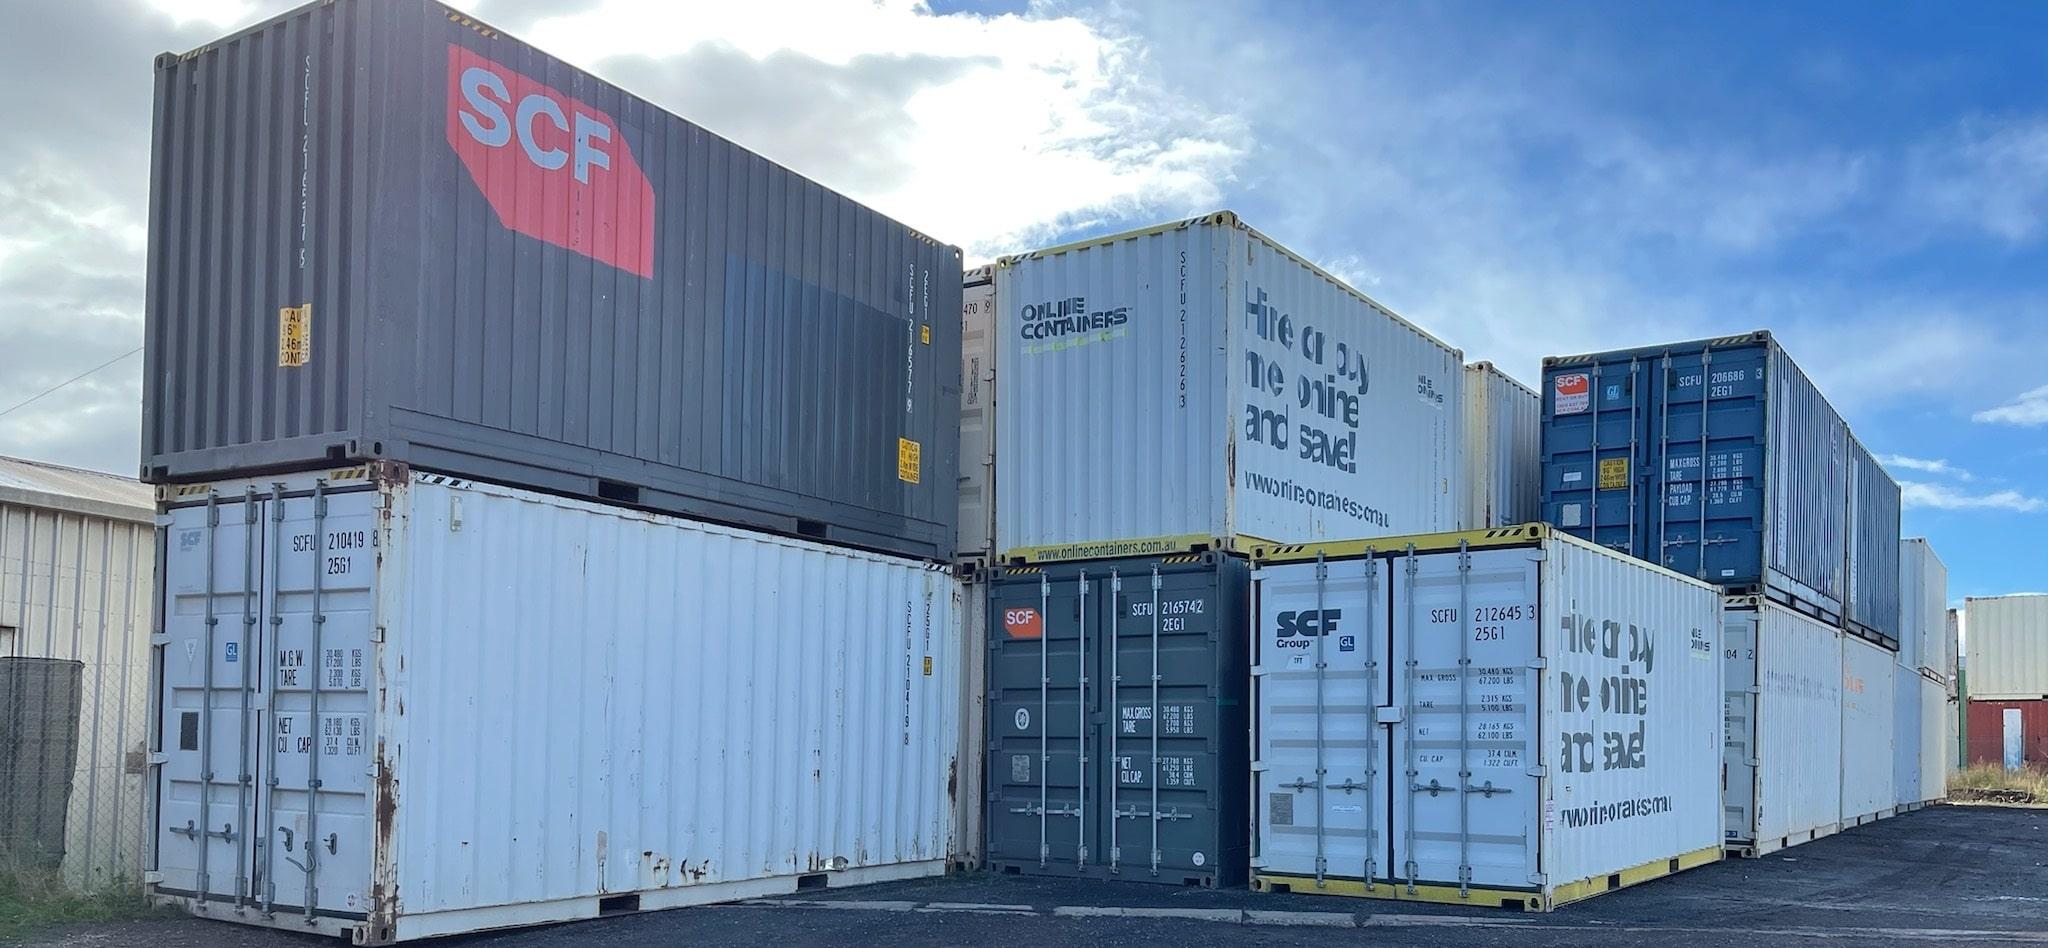 Launceston storage - self storage in Launceston